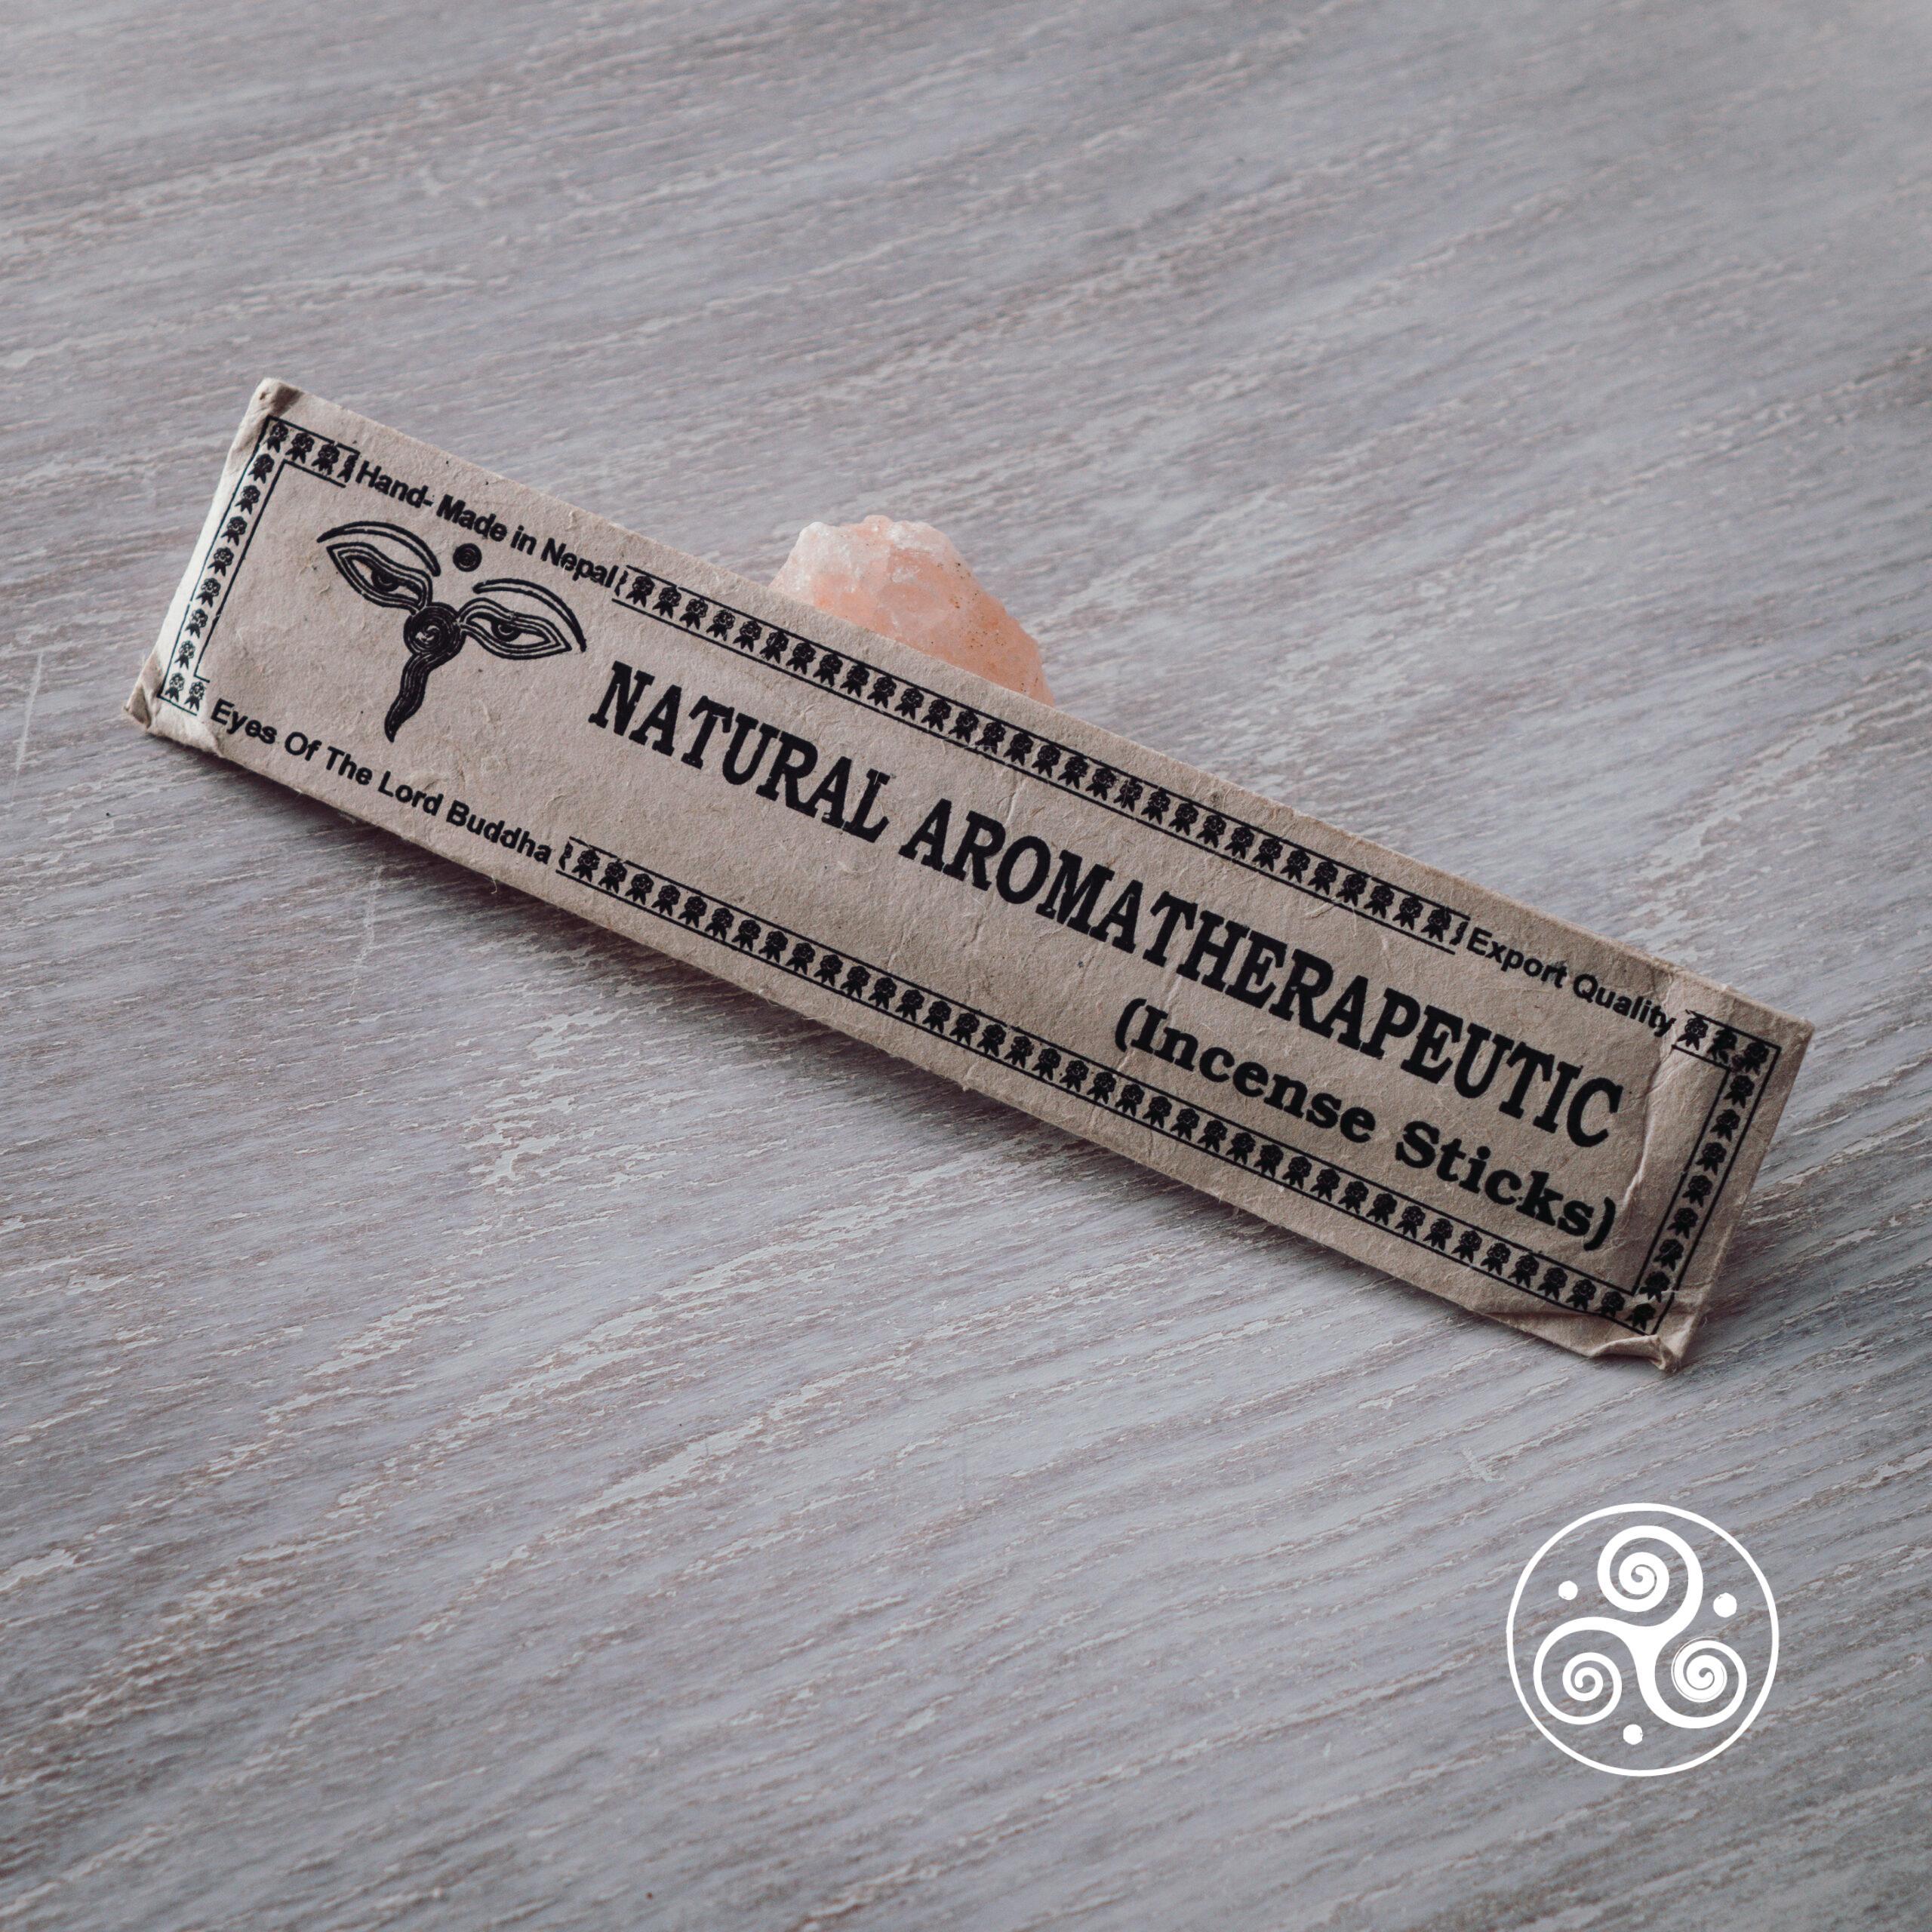 Nepali Lakta Incense Sticks - Natural Aromatherapeutic